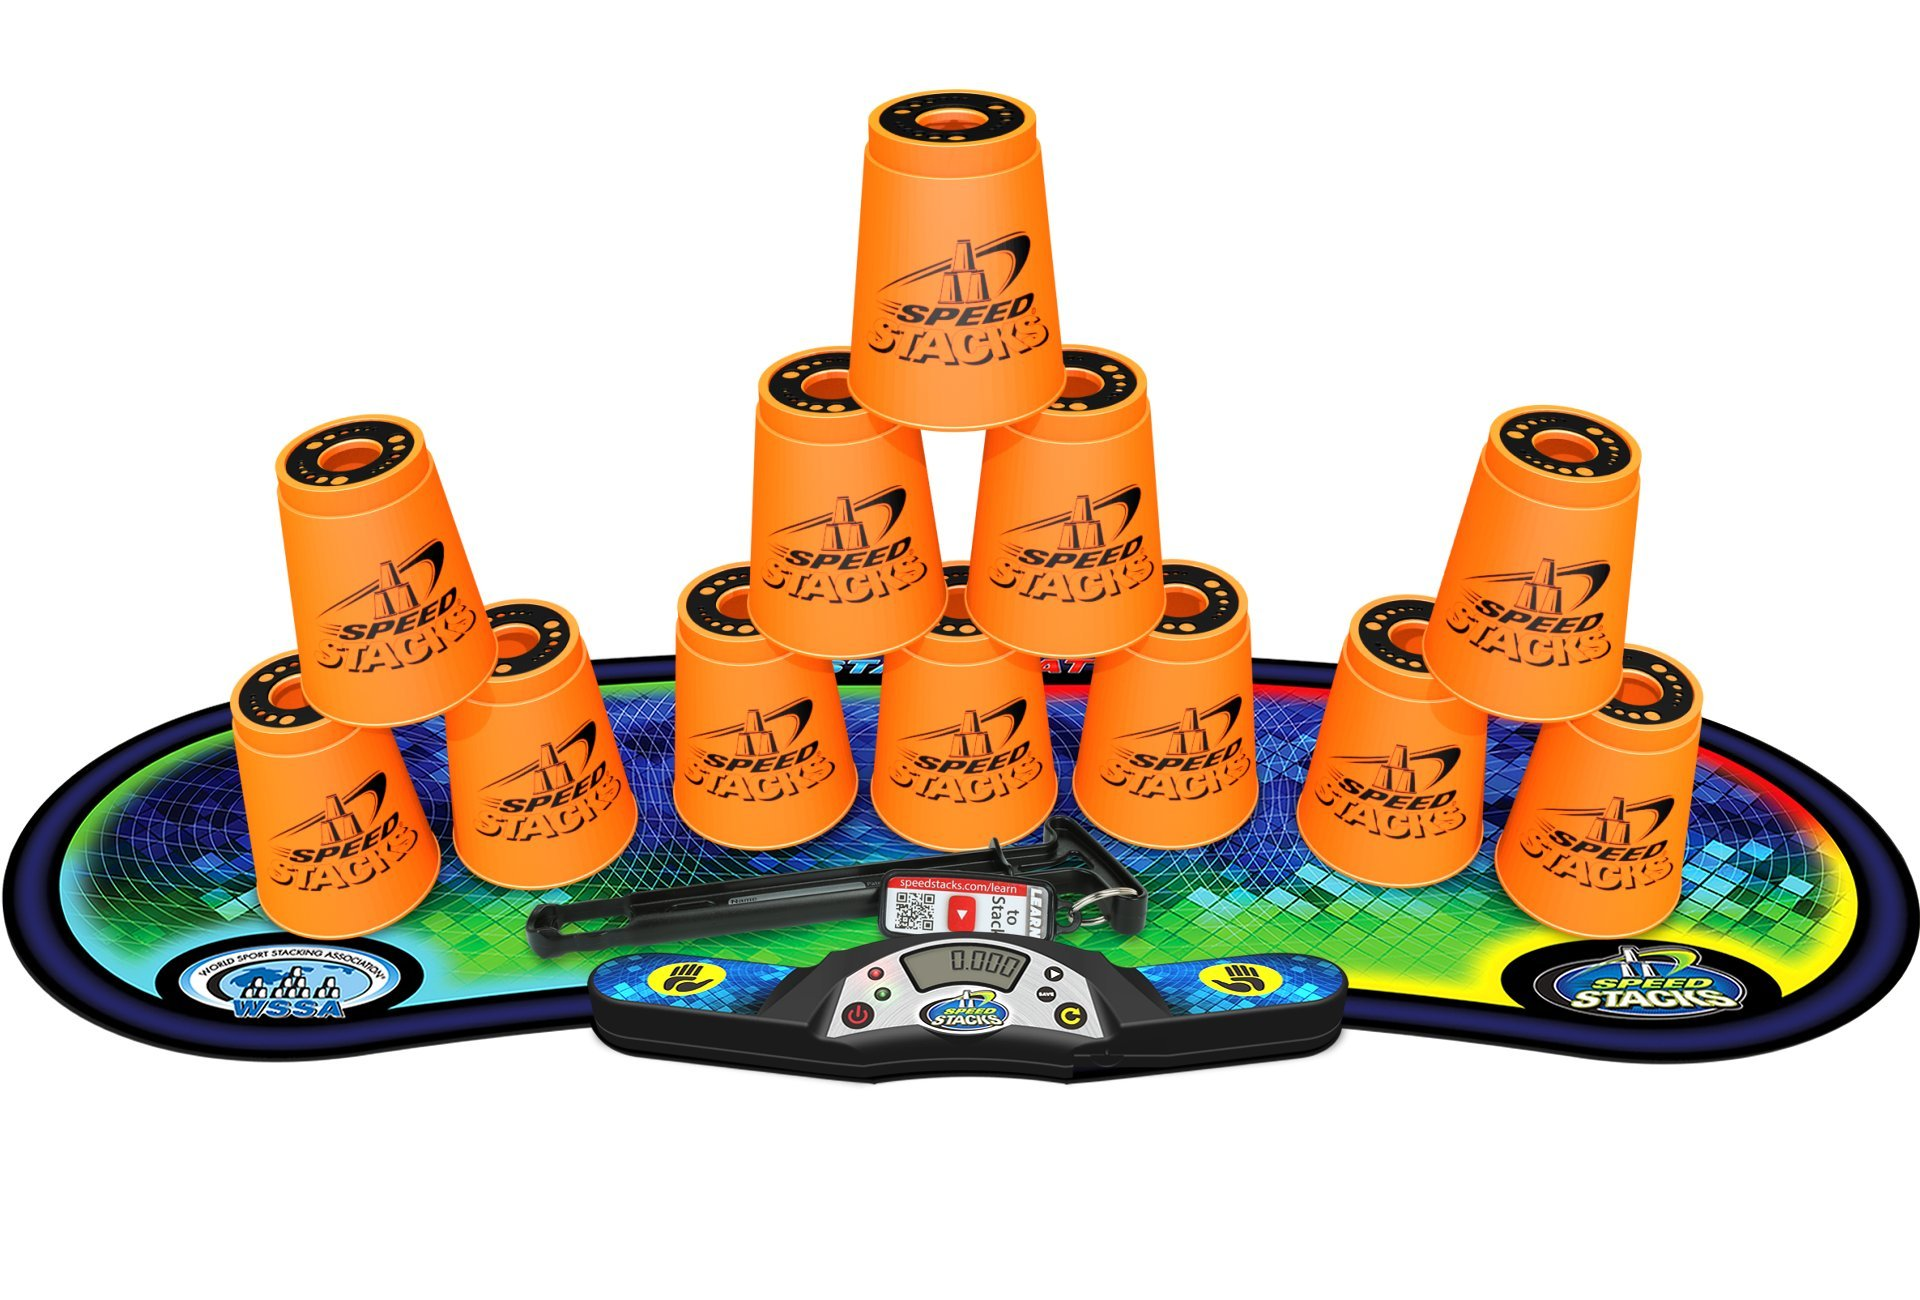 Speed Stacks Competitor - Neon Orange w/ Voxel Glow Mat